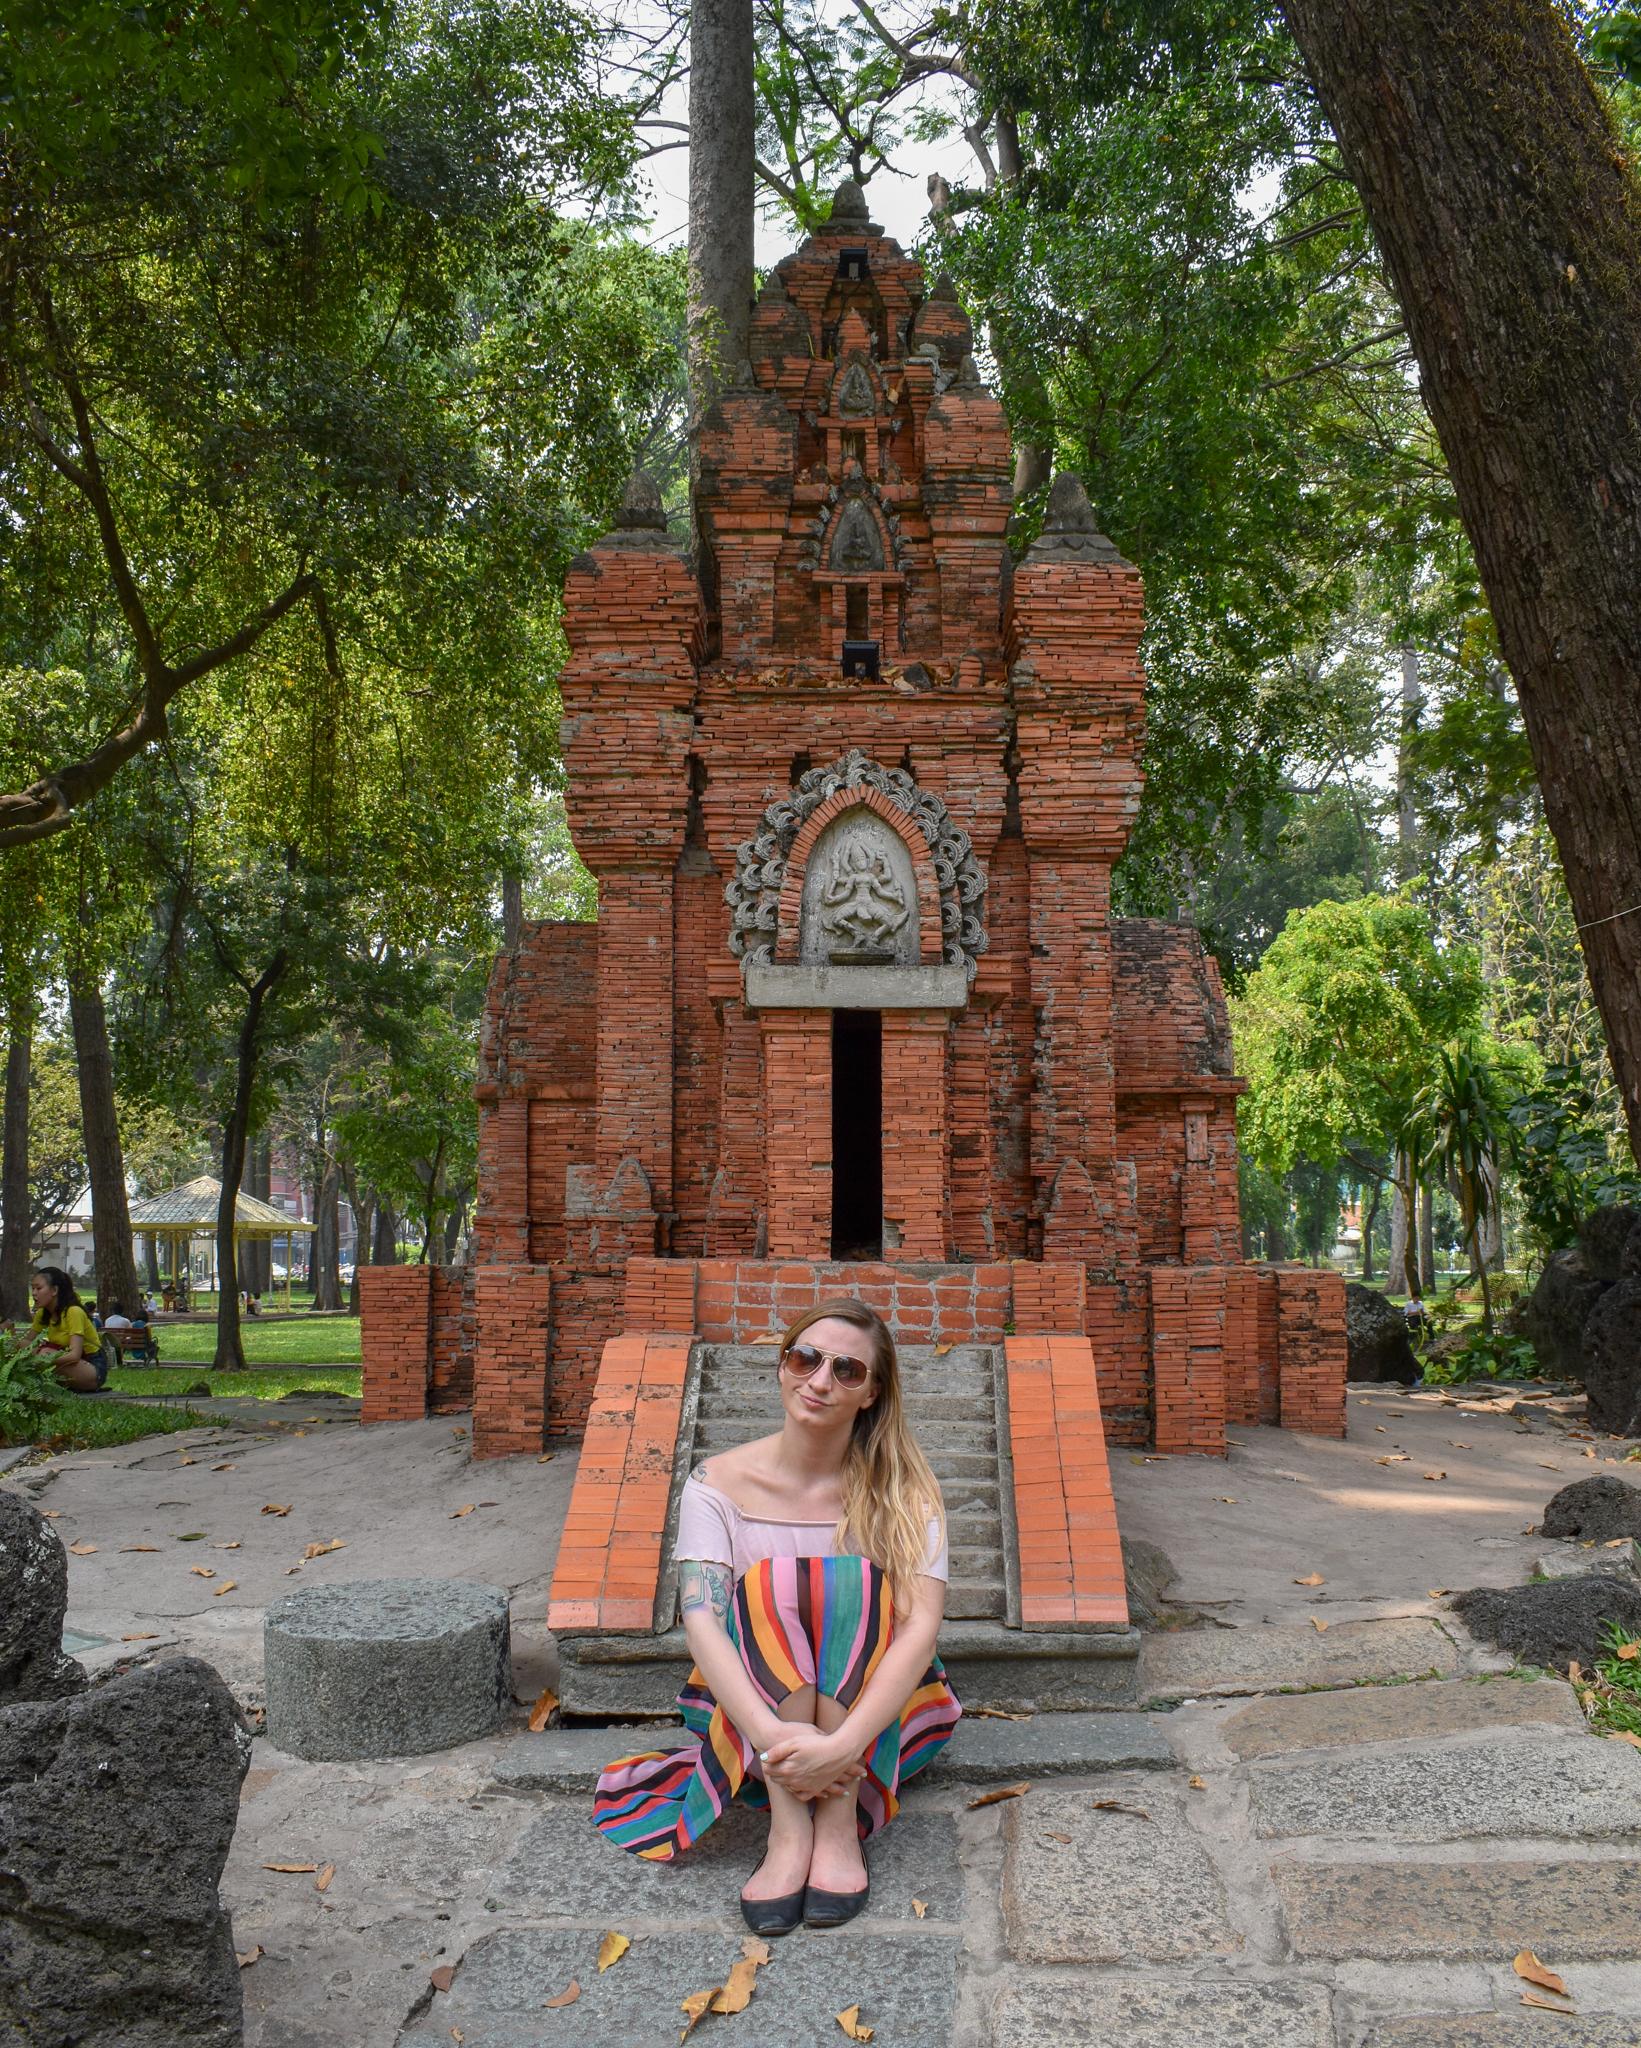 Uprooted-Traveler-48-hour-itinerary-Ho-Chi-Minh-tao-dan-park.jpg